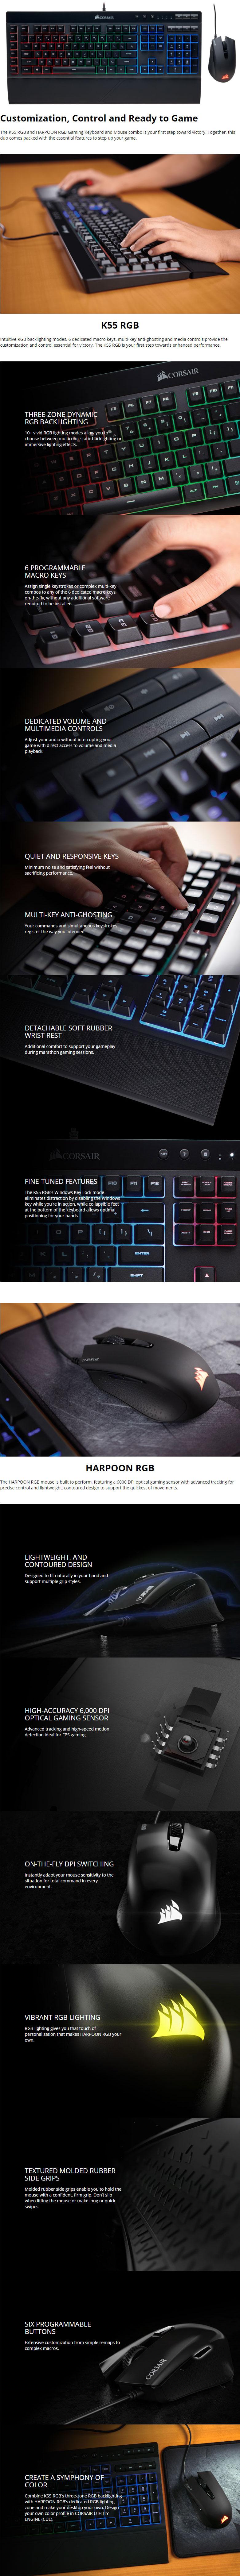 Buy Corsair K55 RGB Gaming Keyboard & Mouse Online